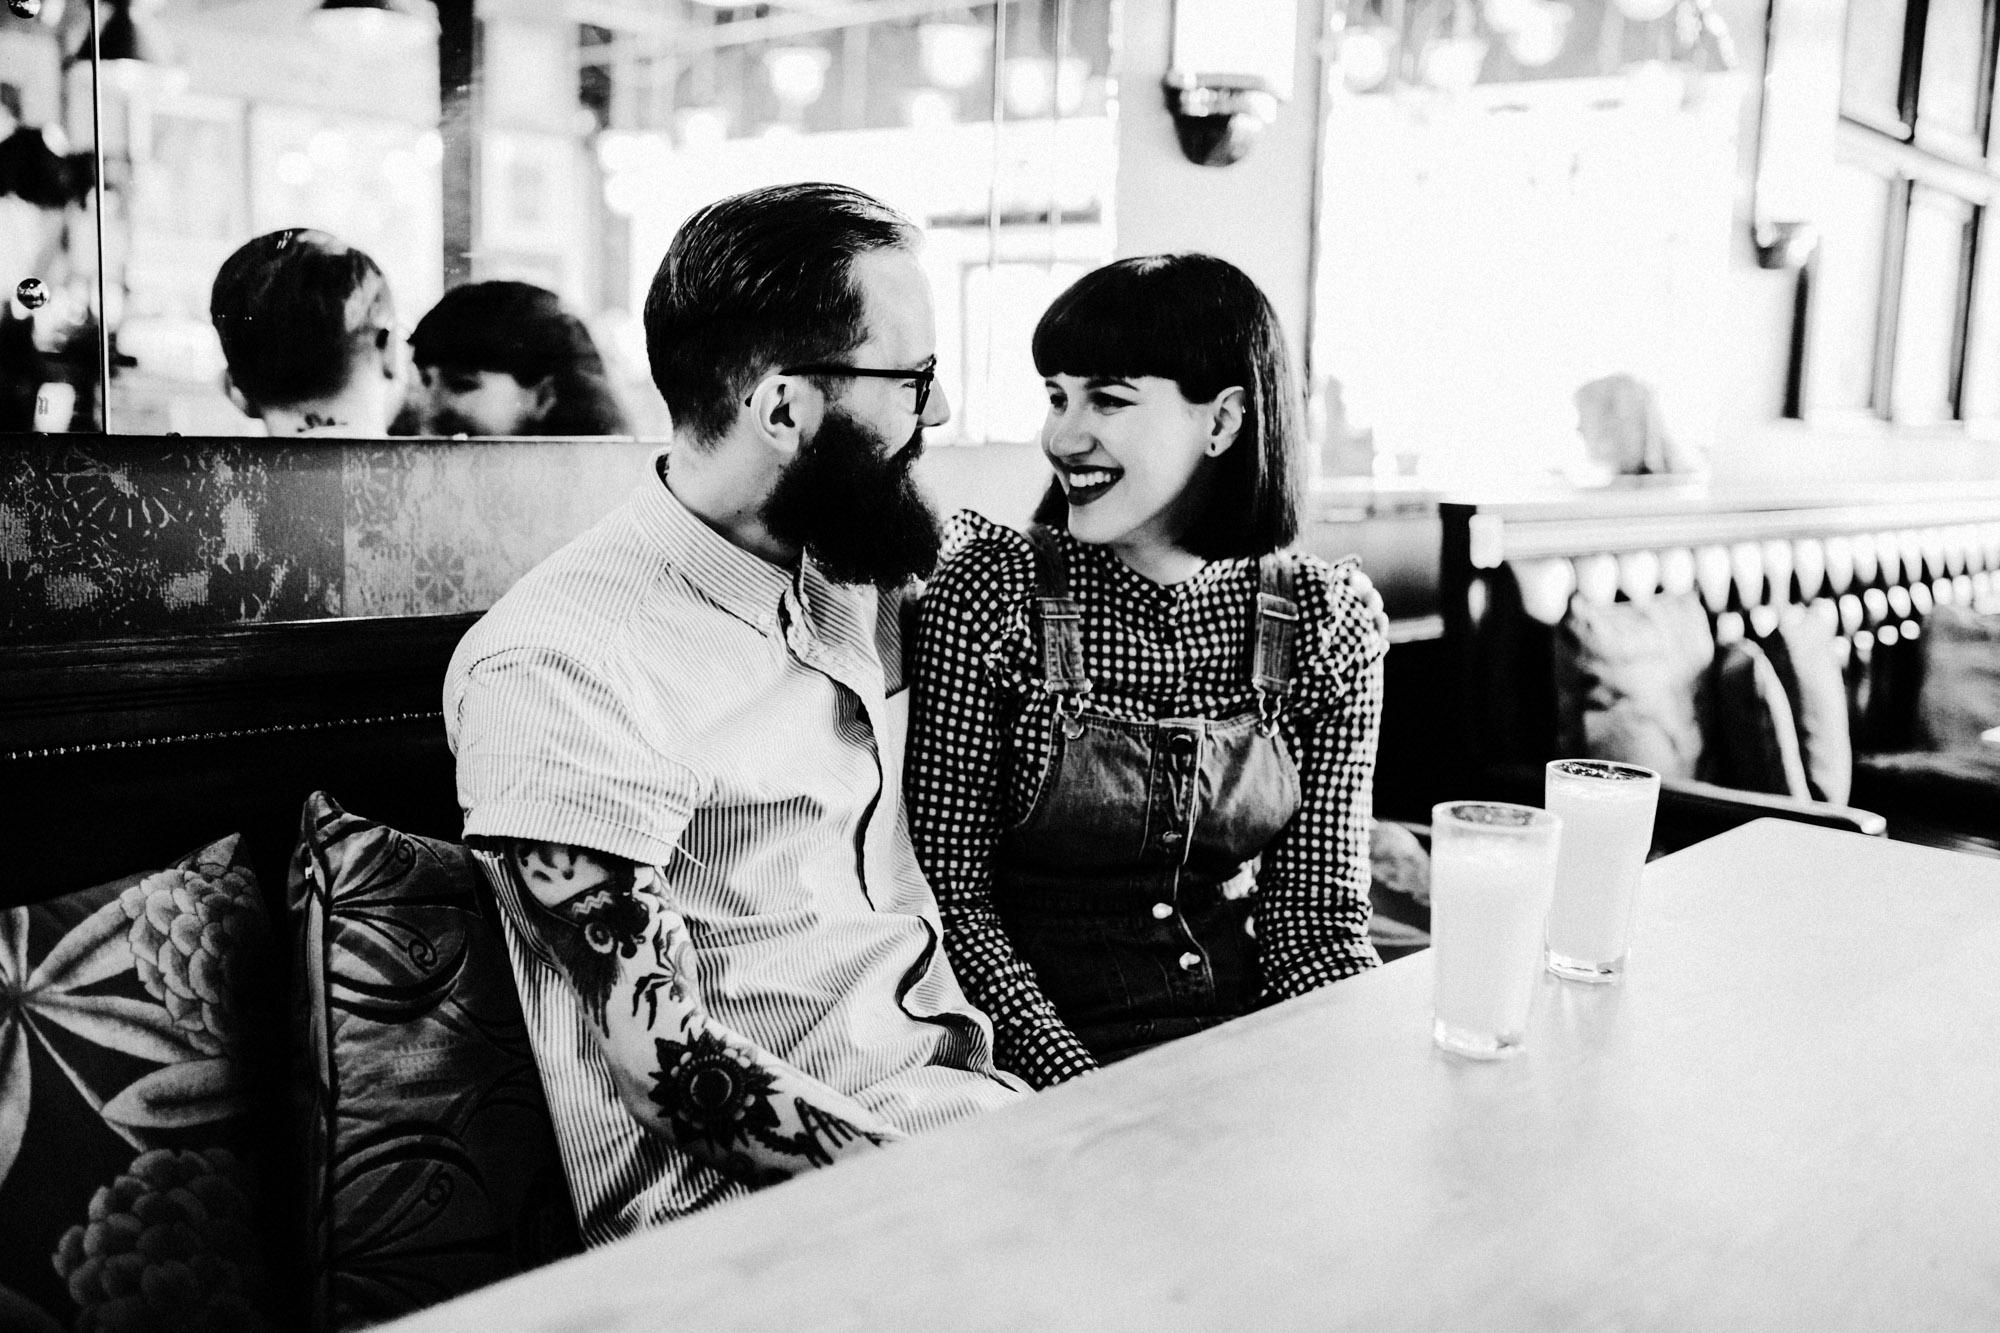 Cafe-Bar-Engagement-Photography38.jpg